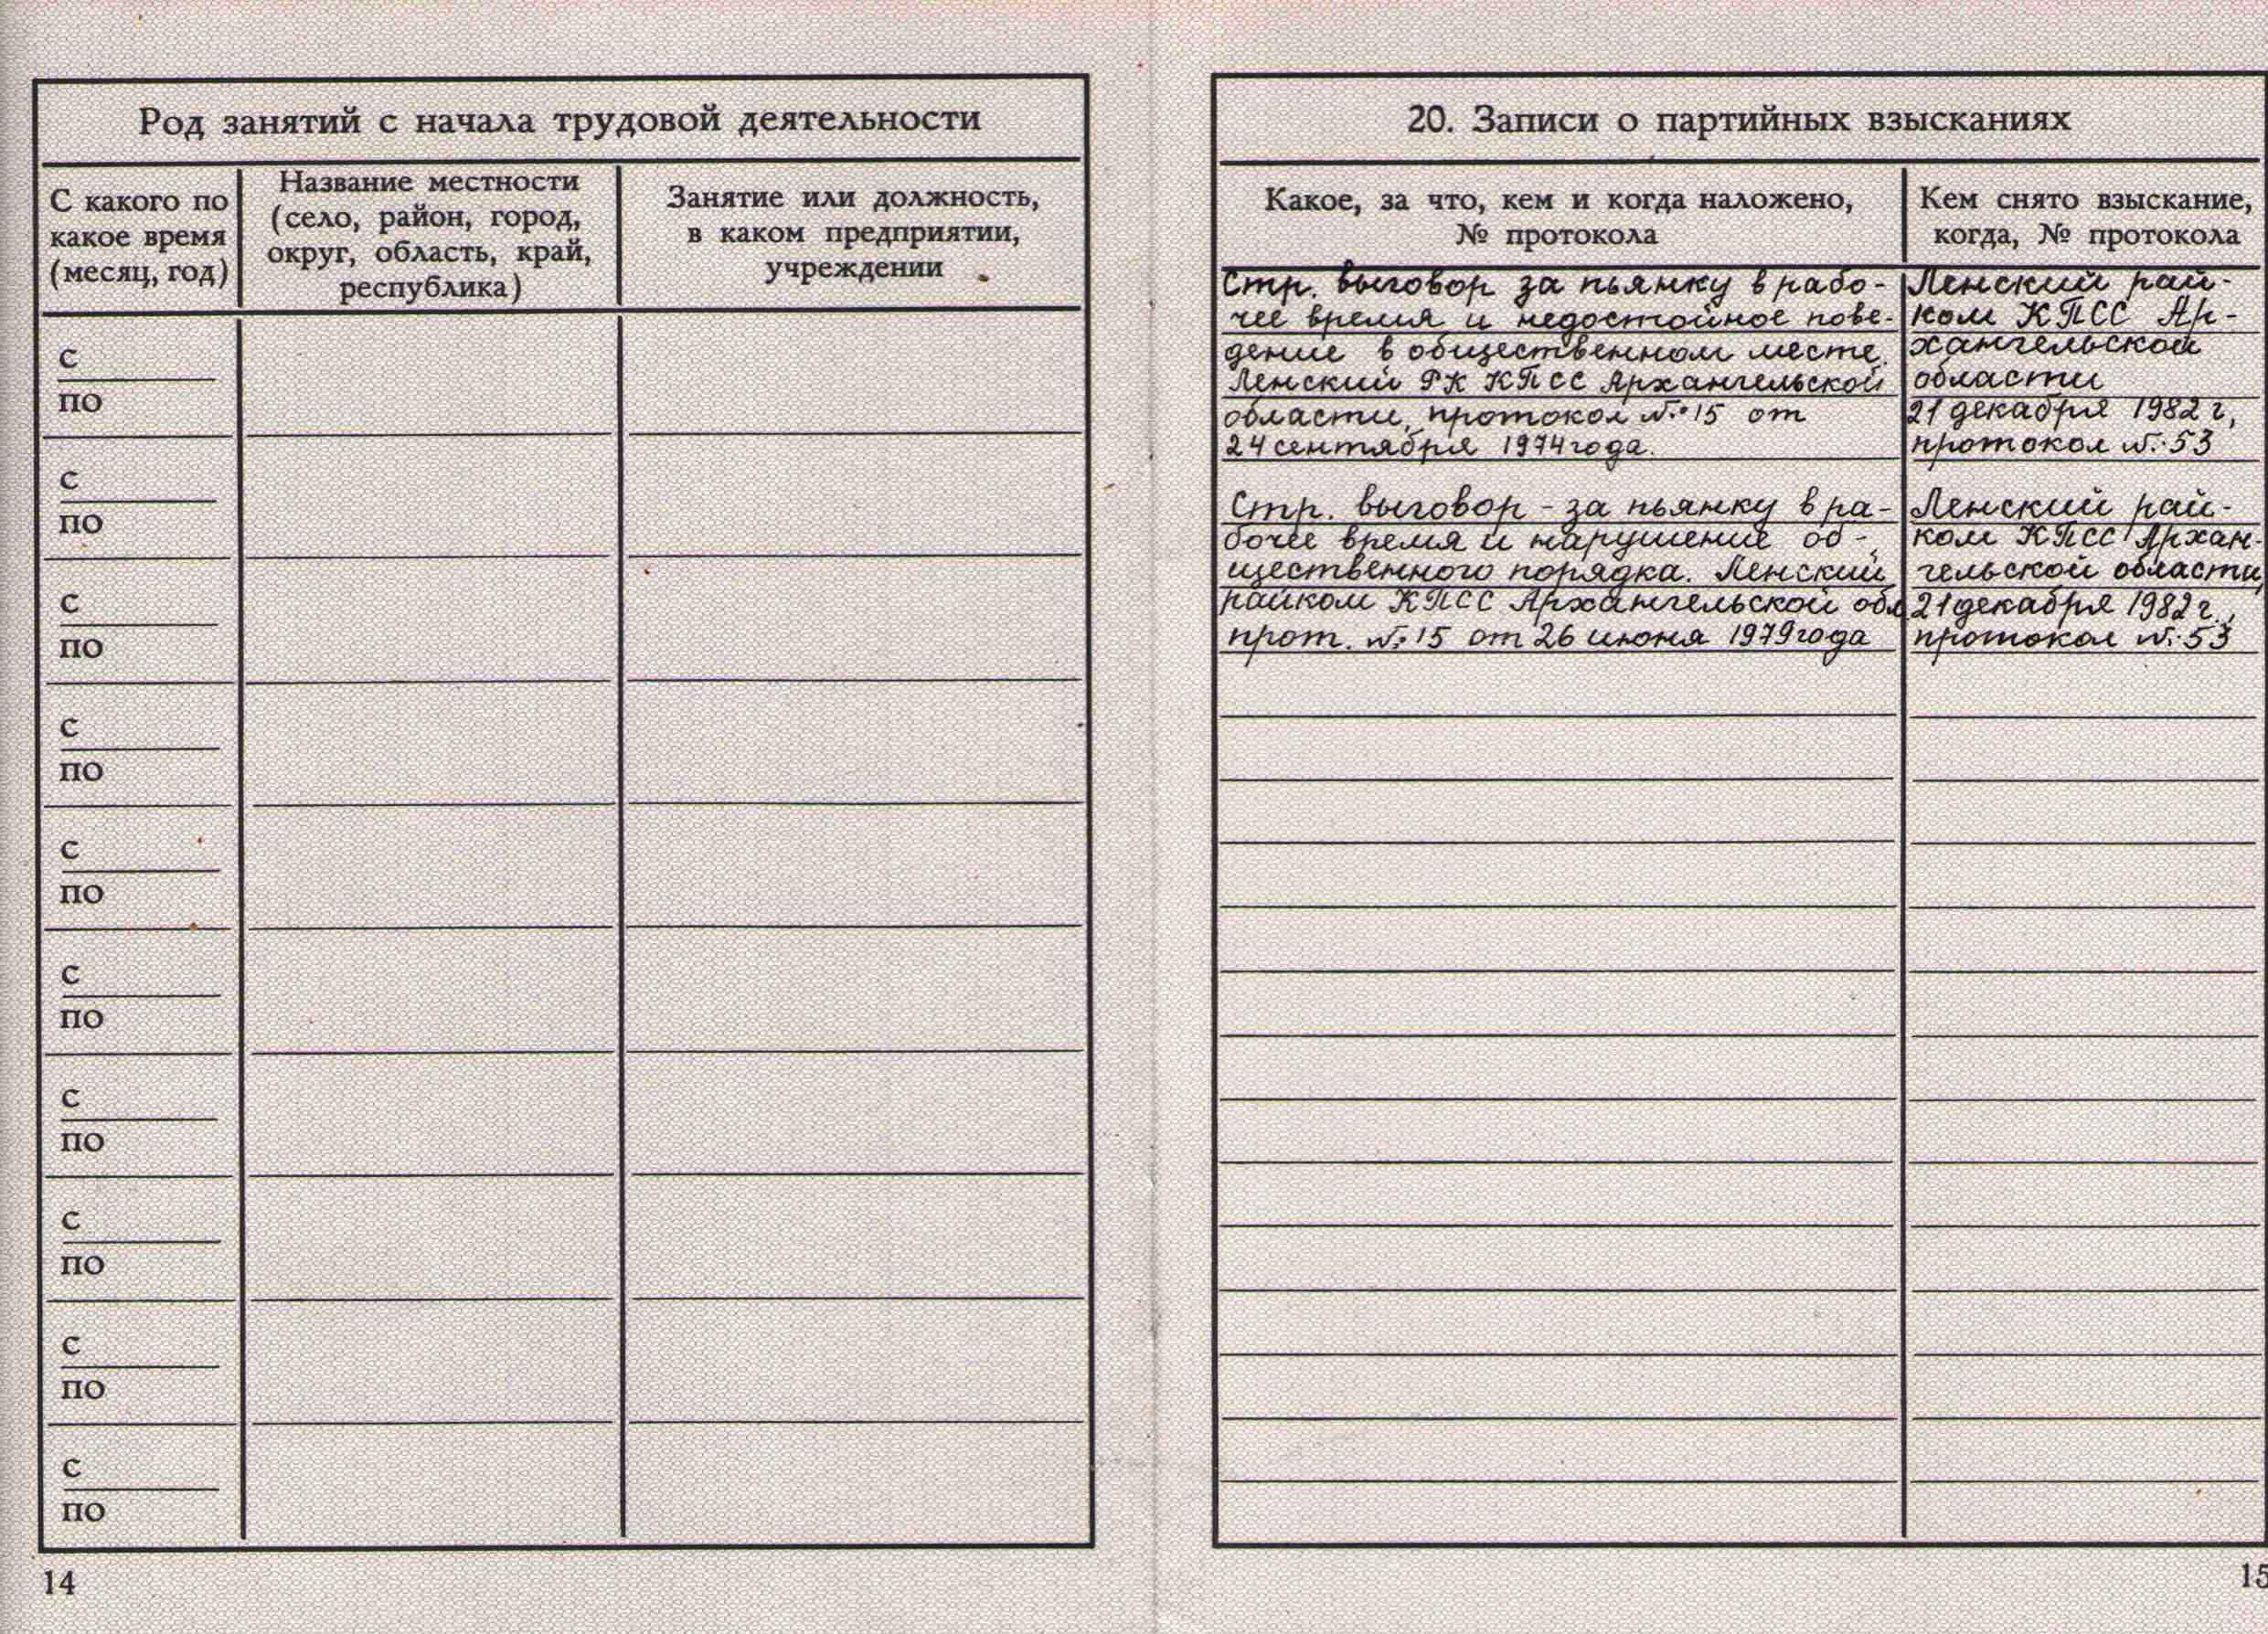 86. Учетная карточка члена партии Барыкина ПП, 1974.